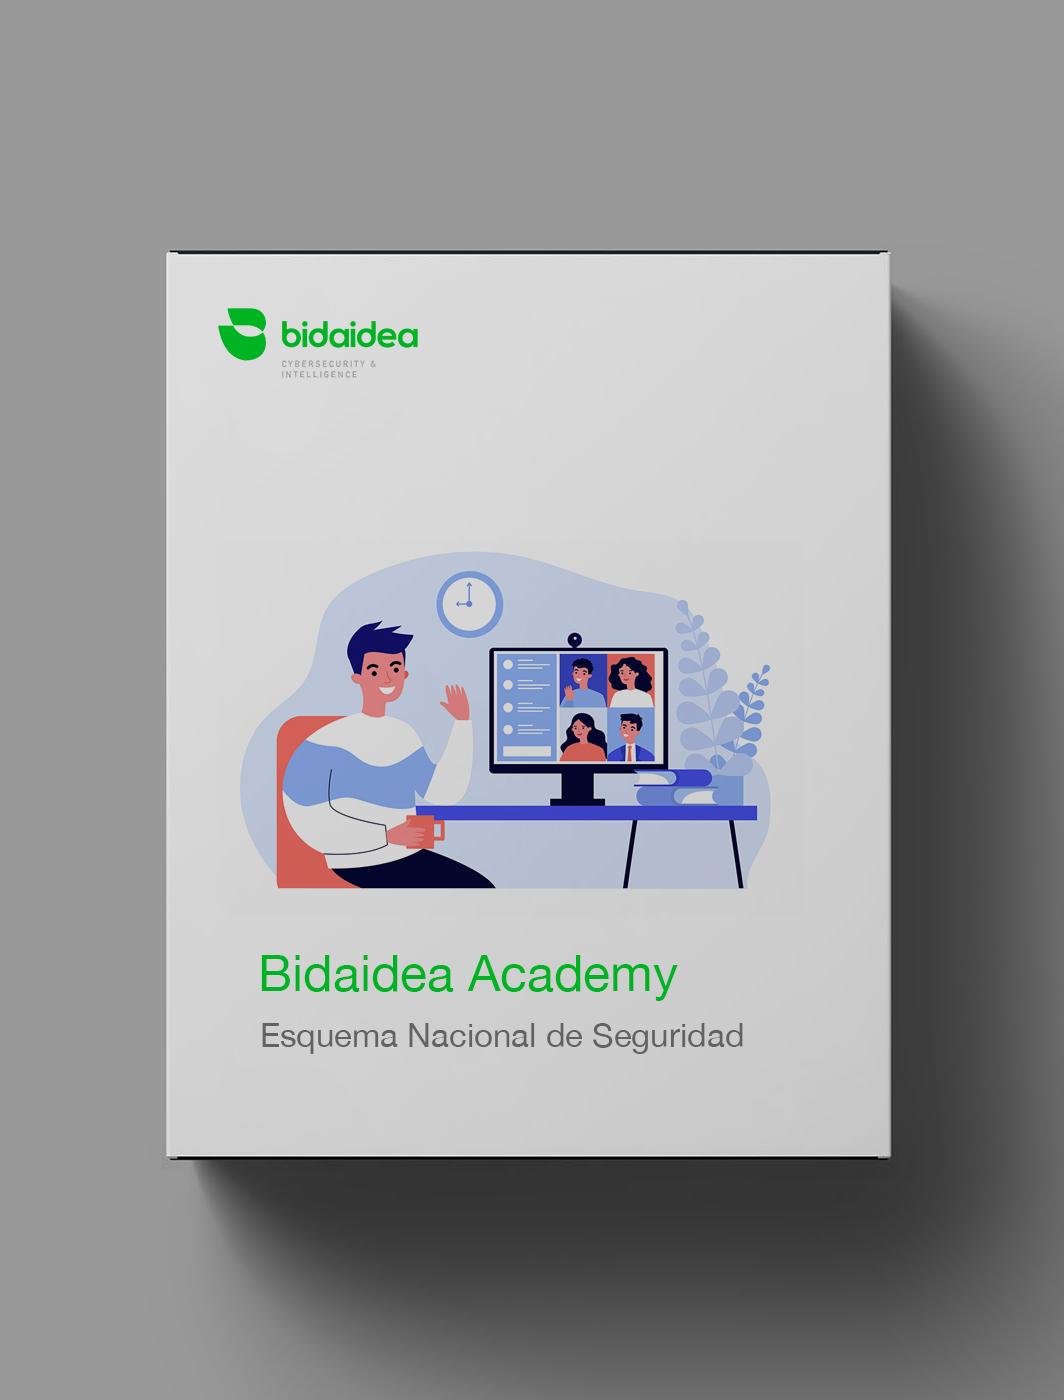 cyberpacks bidaidea academy 02 - Empresa de Ciberseguridad